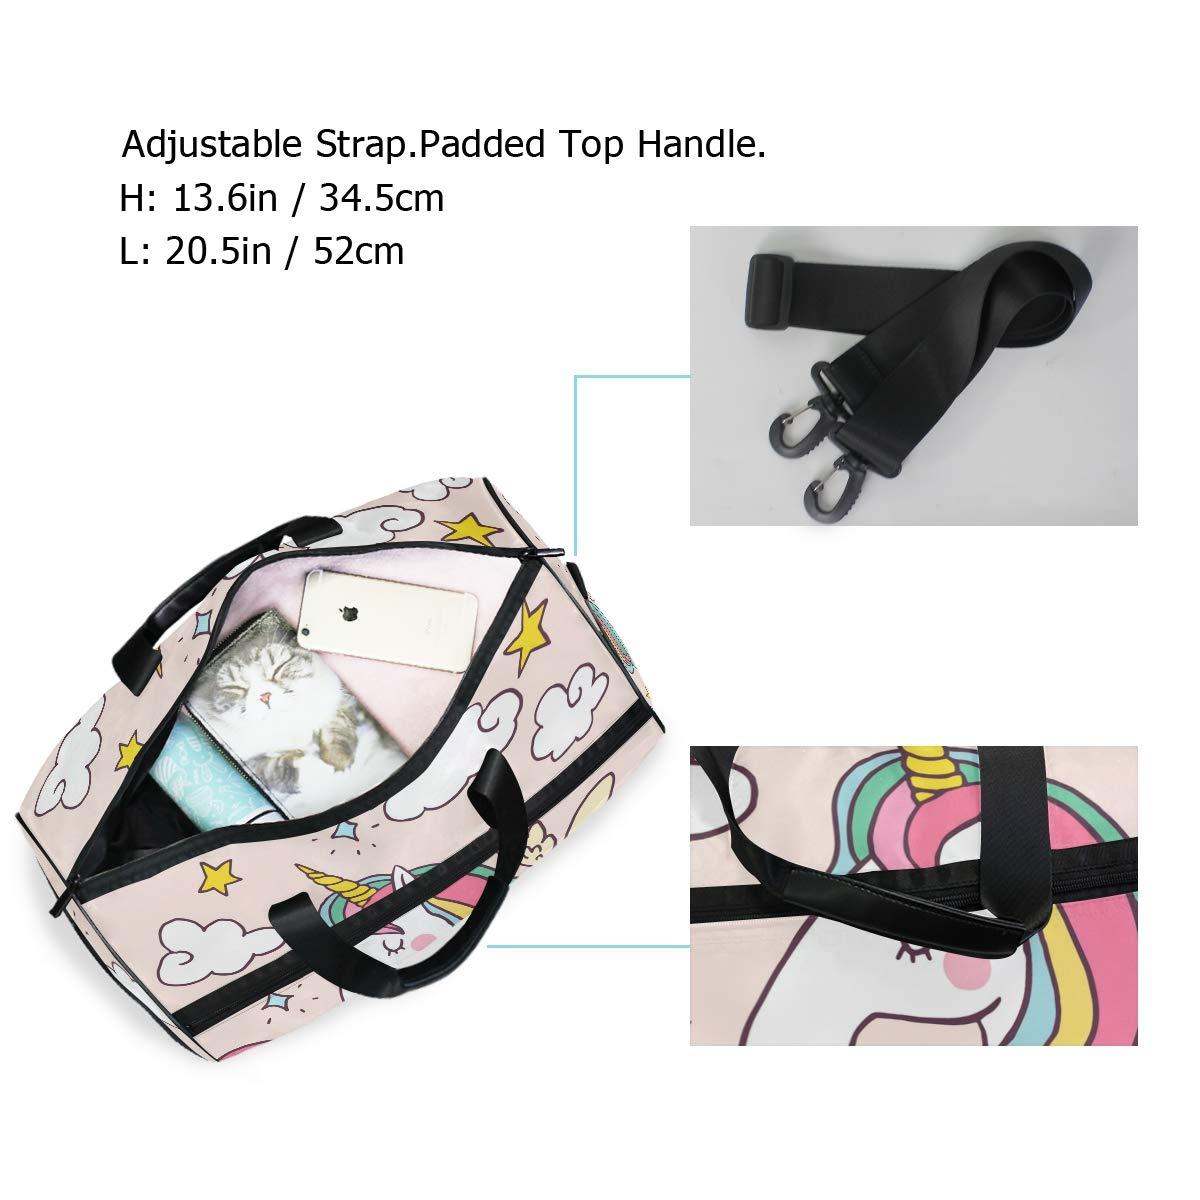 Gym Vacation Travel Duffel Bag Rainbow Unicorn Waterproof Lightweight Luggage bag for Sports